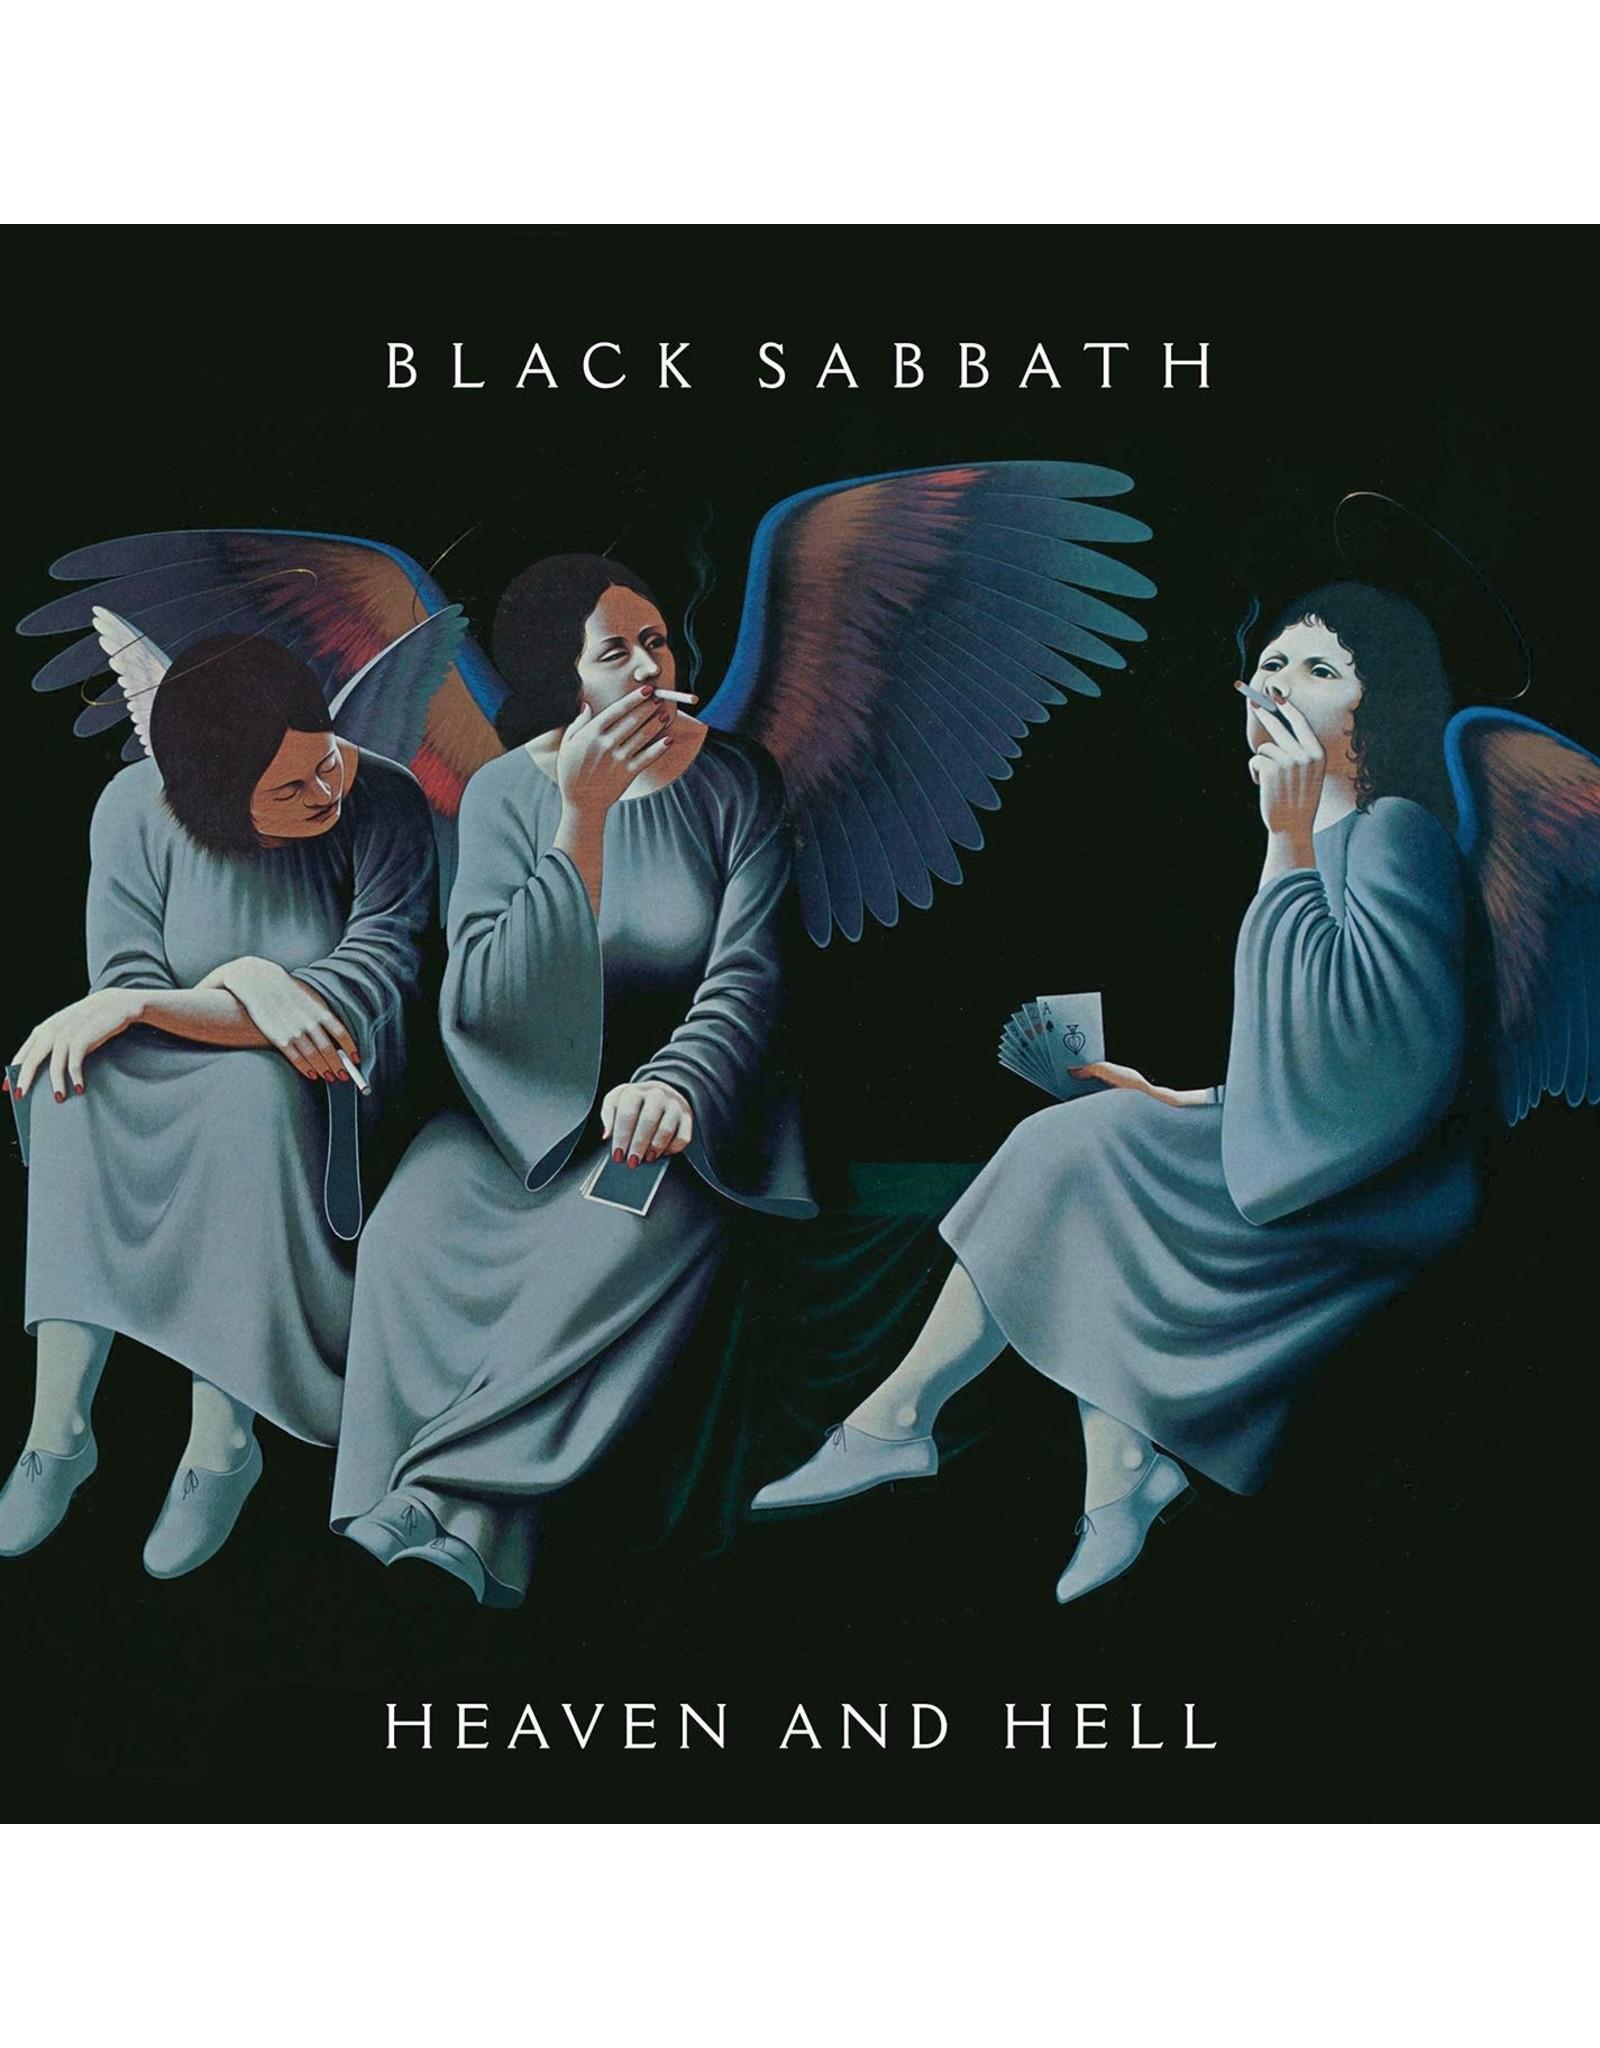 Black Sabbath - Heaven and Hell LP